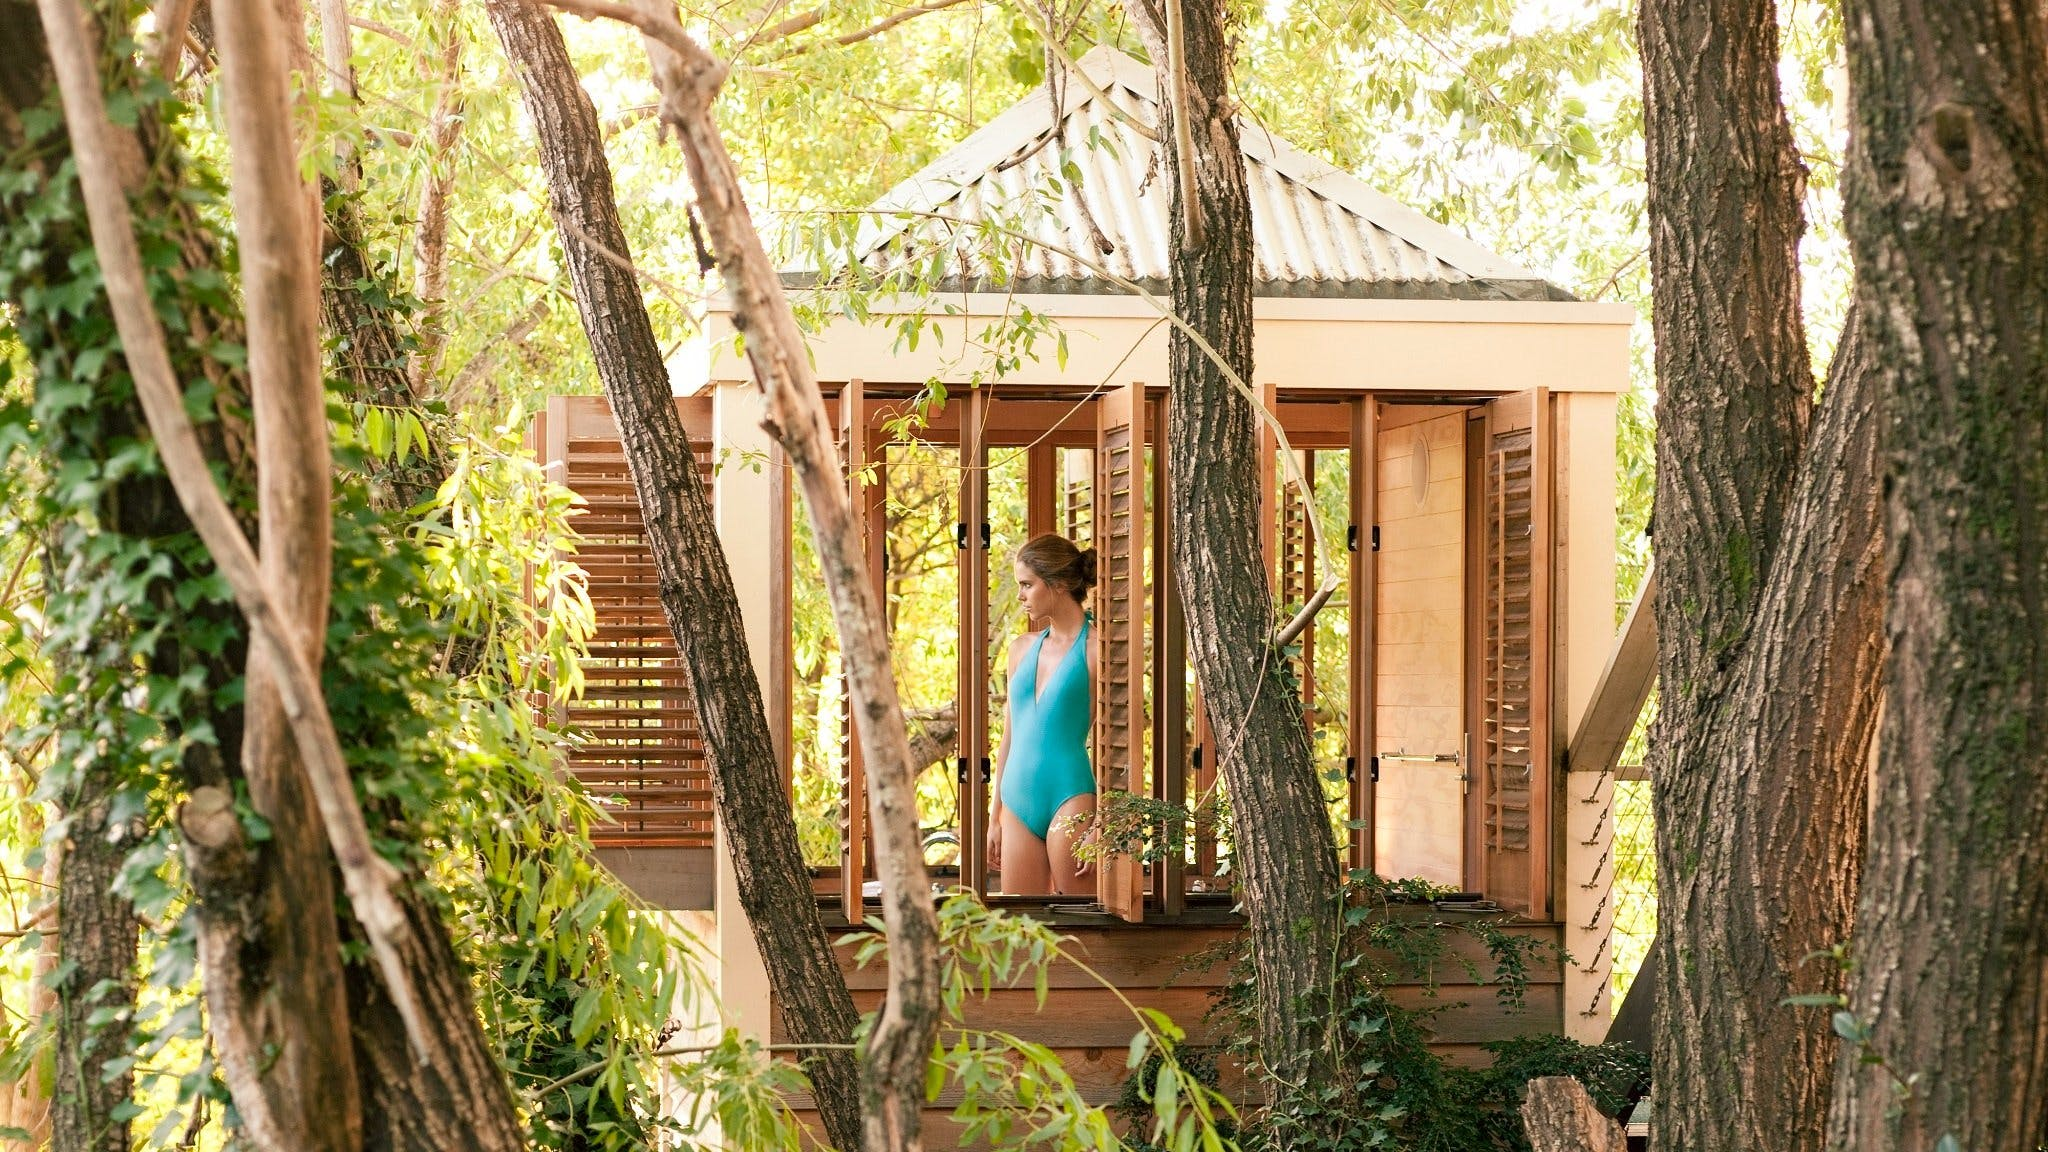 Salus Spa At Lake House Attraction Daylesford The Macedon Ranges Victoria Australia